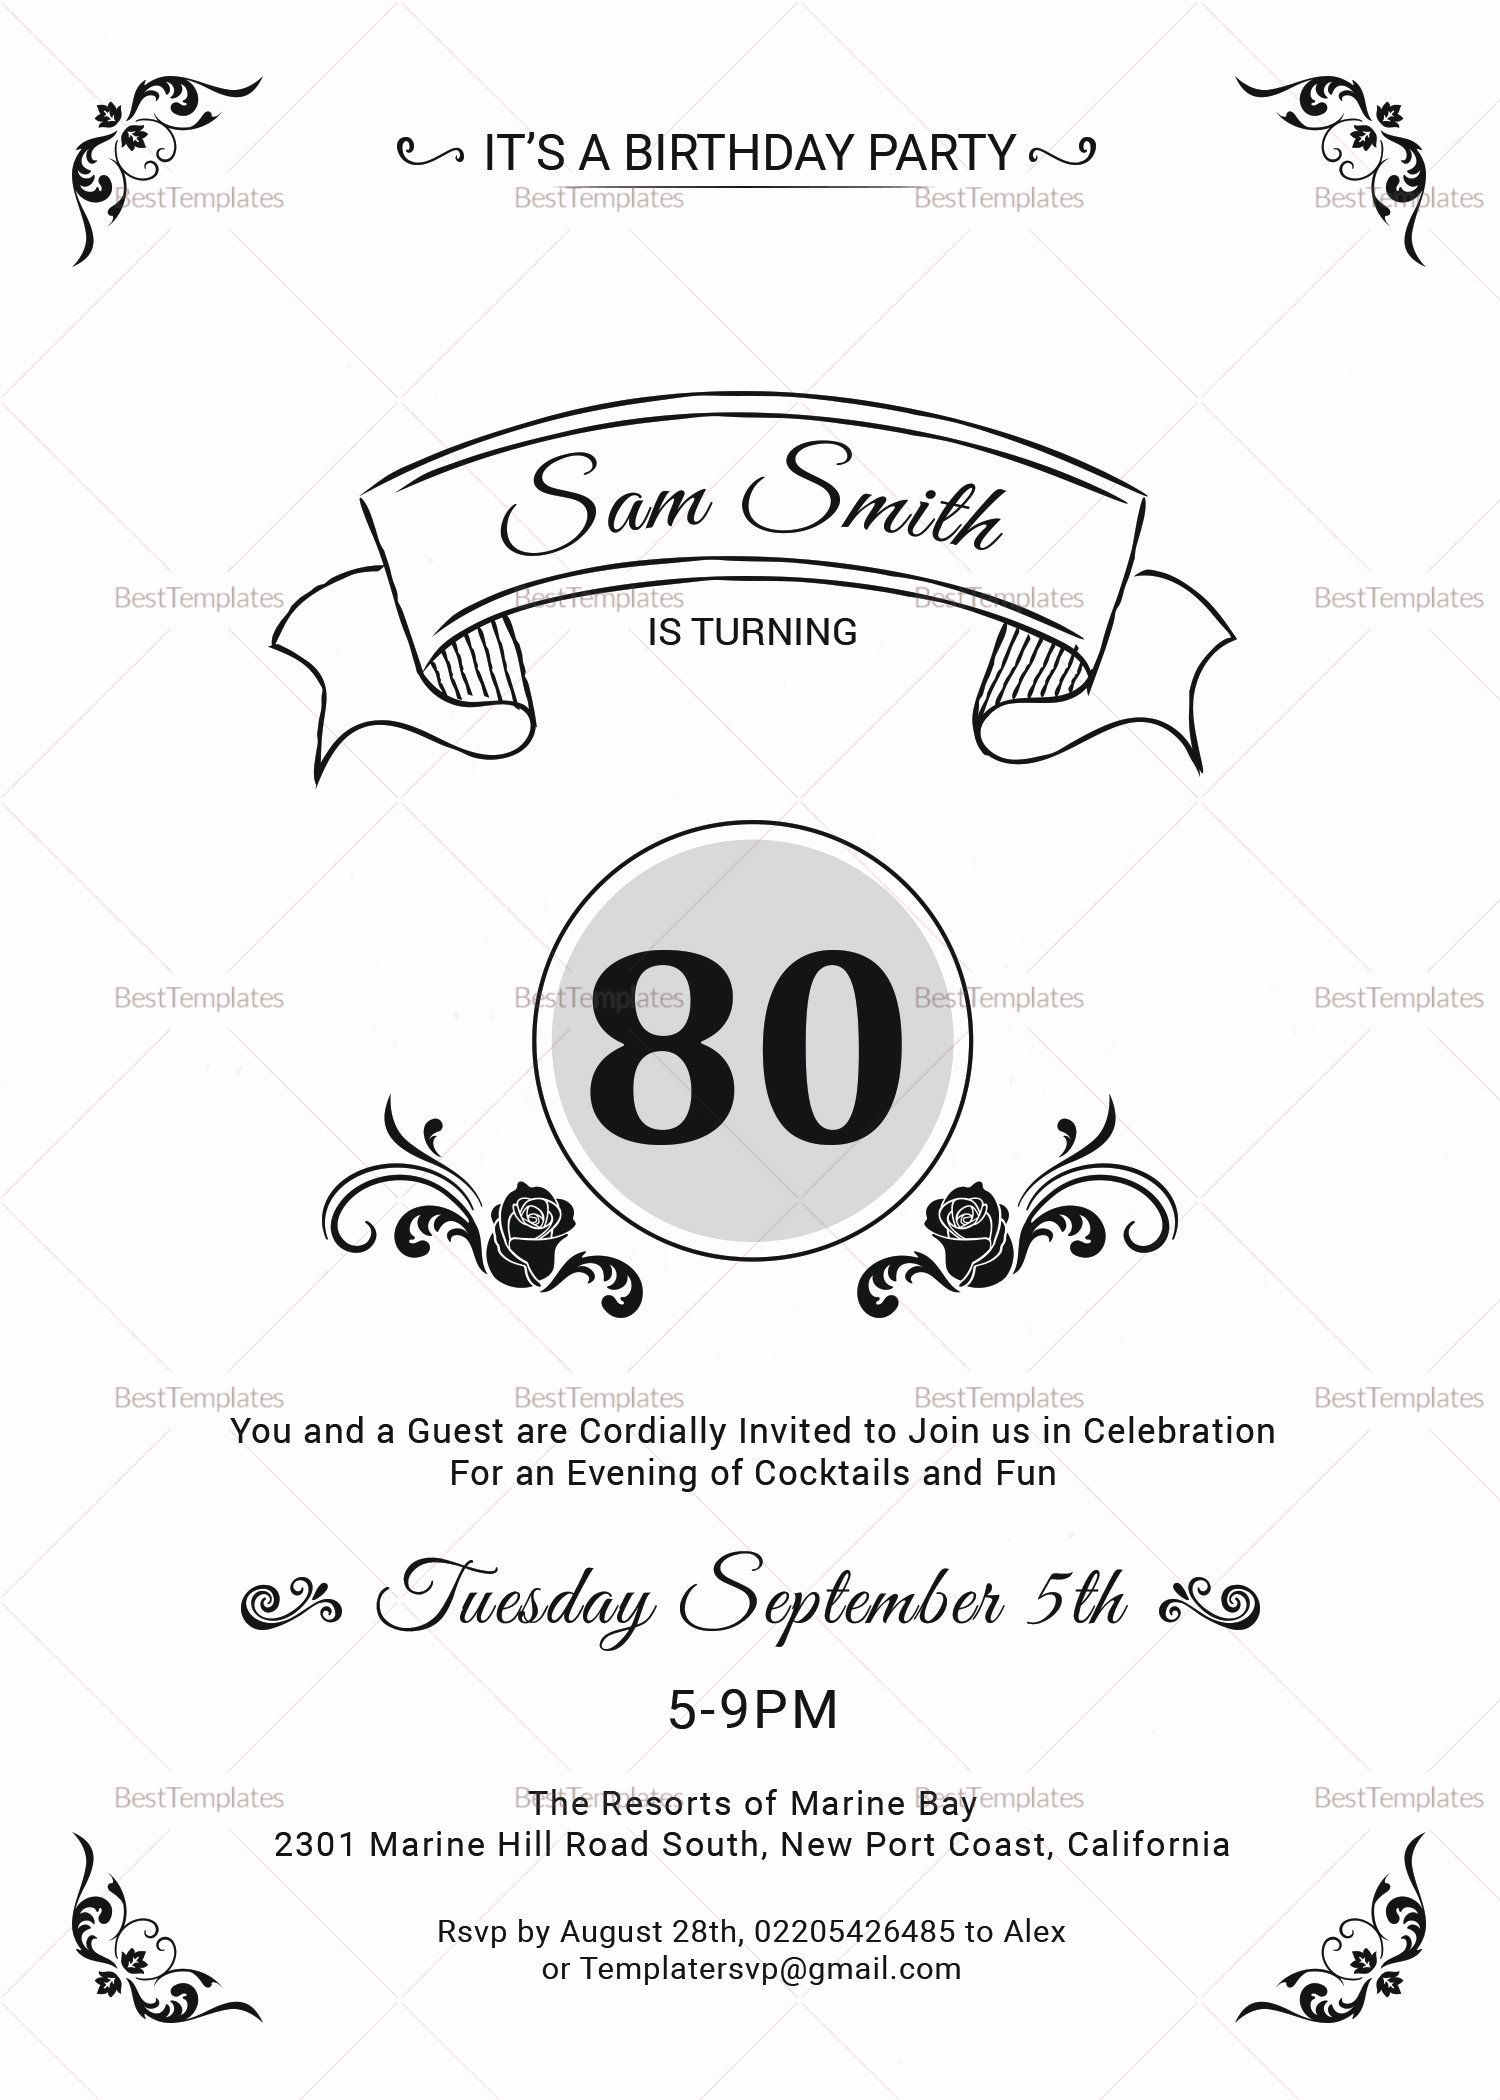 Birthday Invitation Template Photoshop Fresh 80th Birthday Party